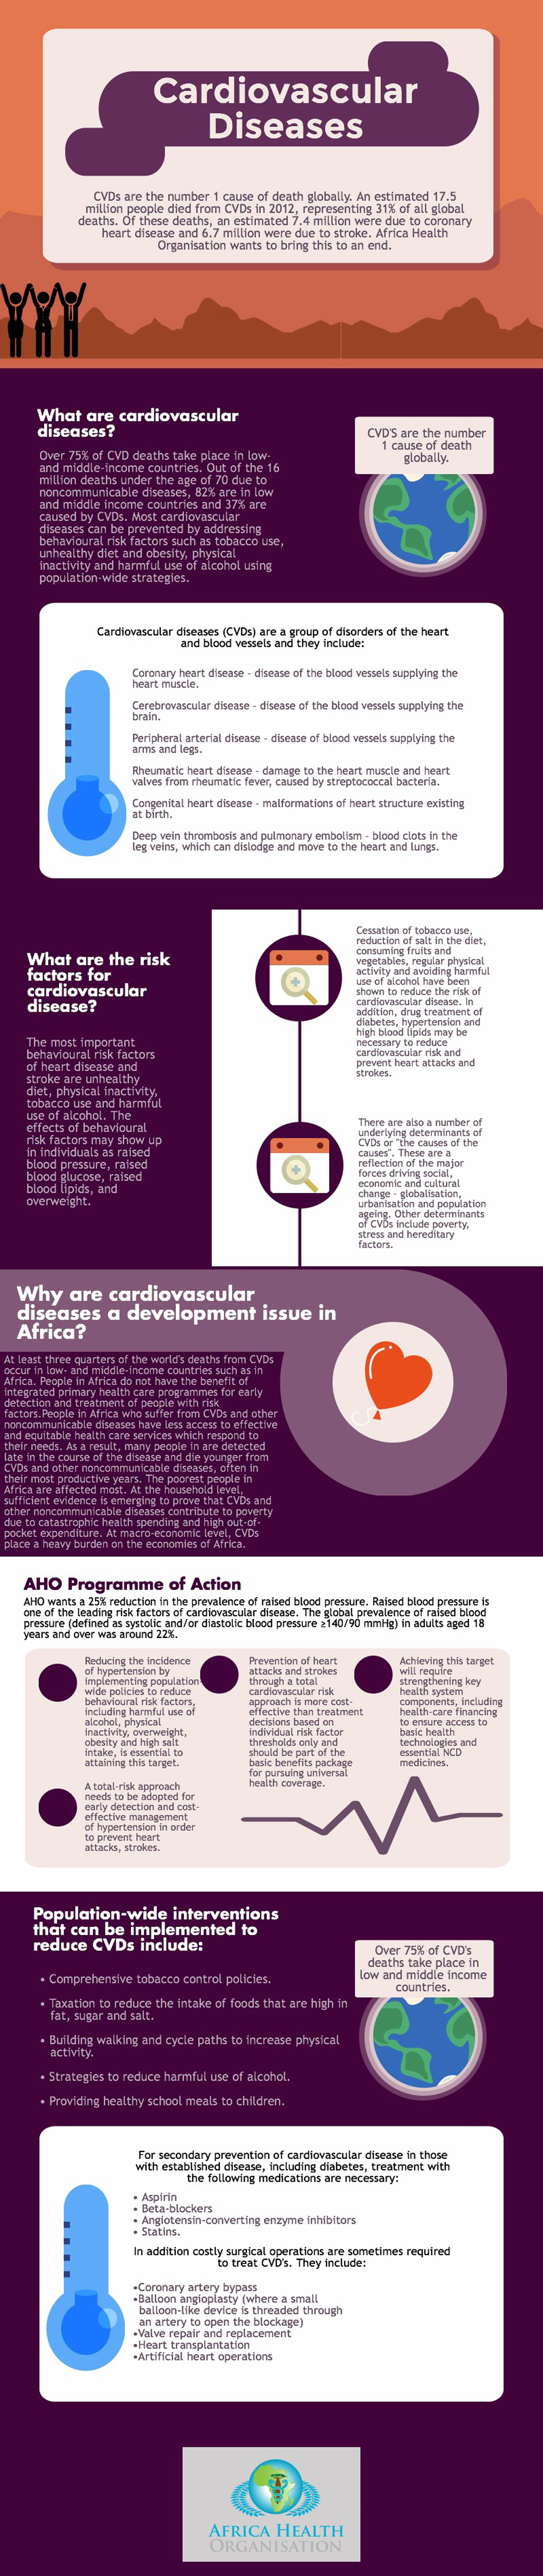 Cardiovascular diseases | Africa Health Organisation